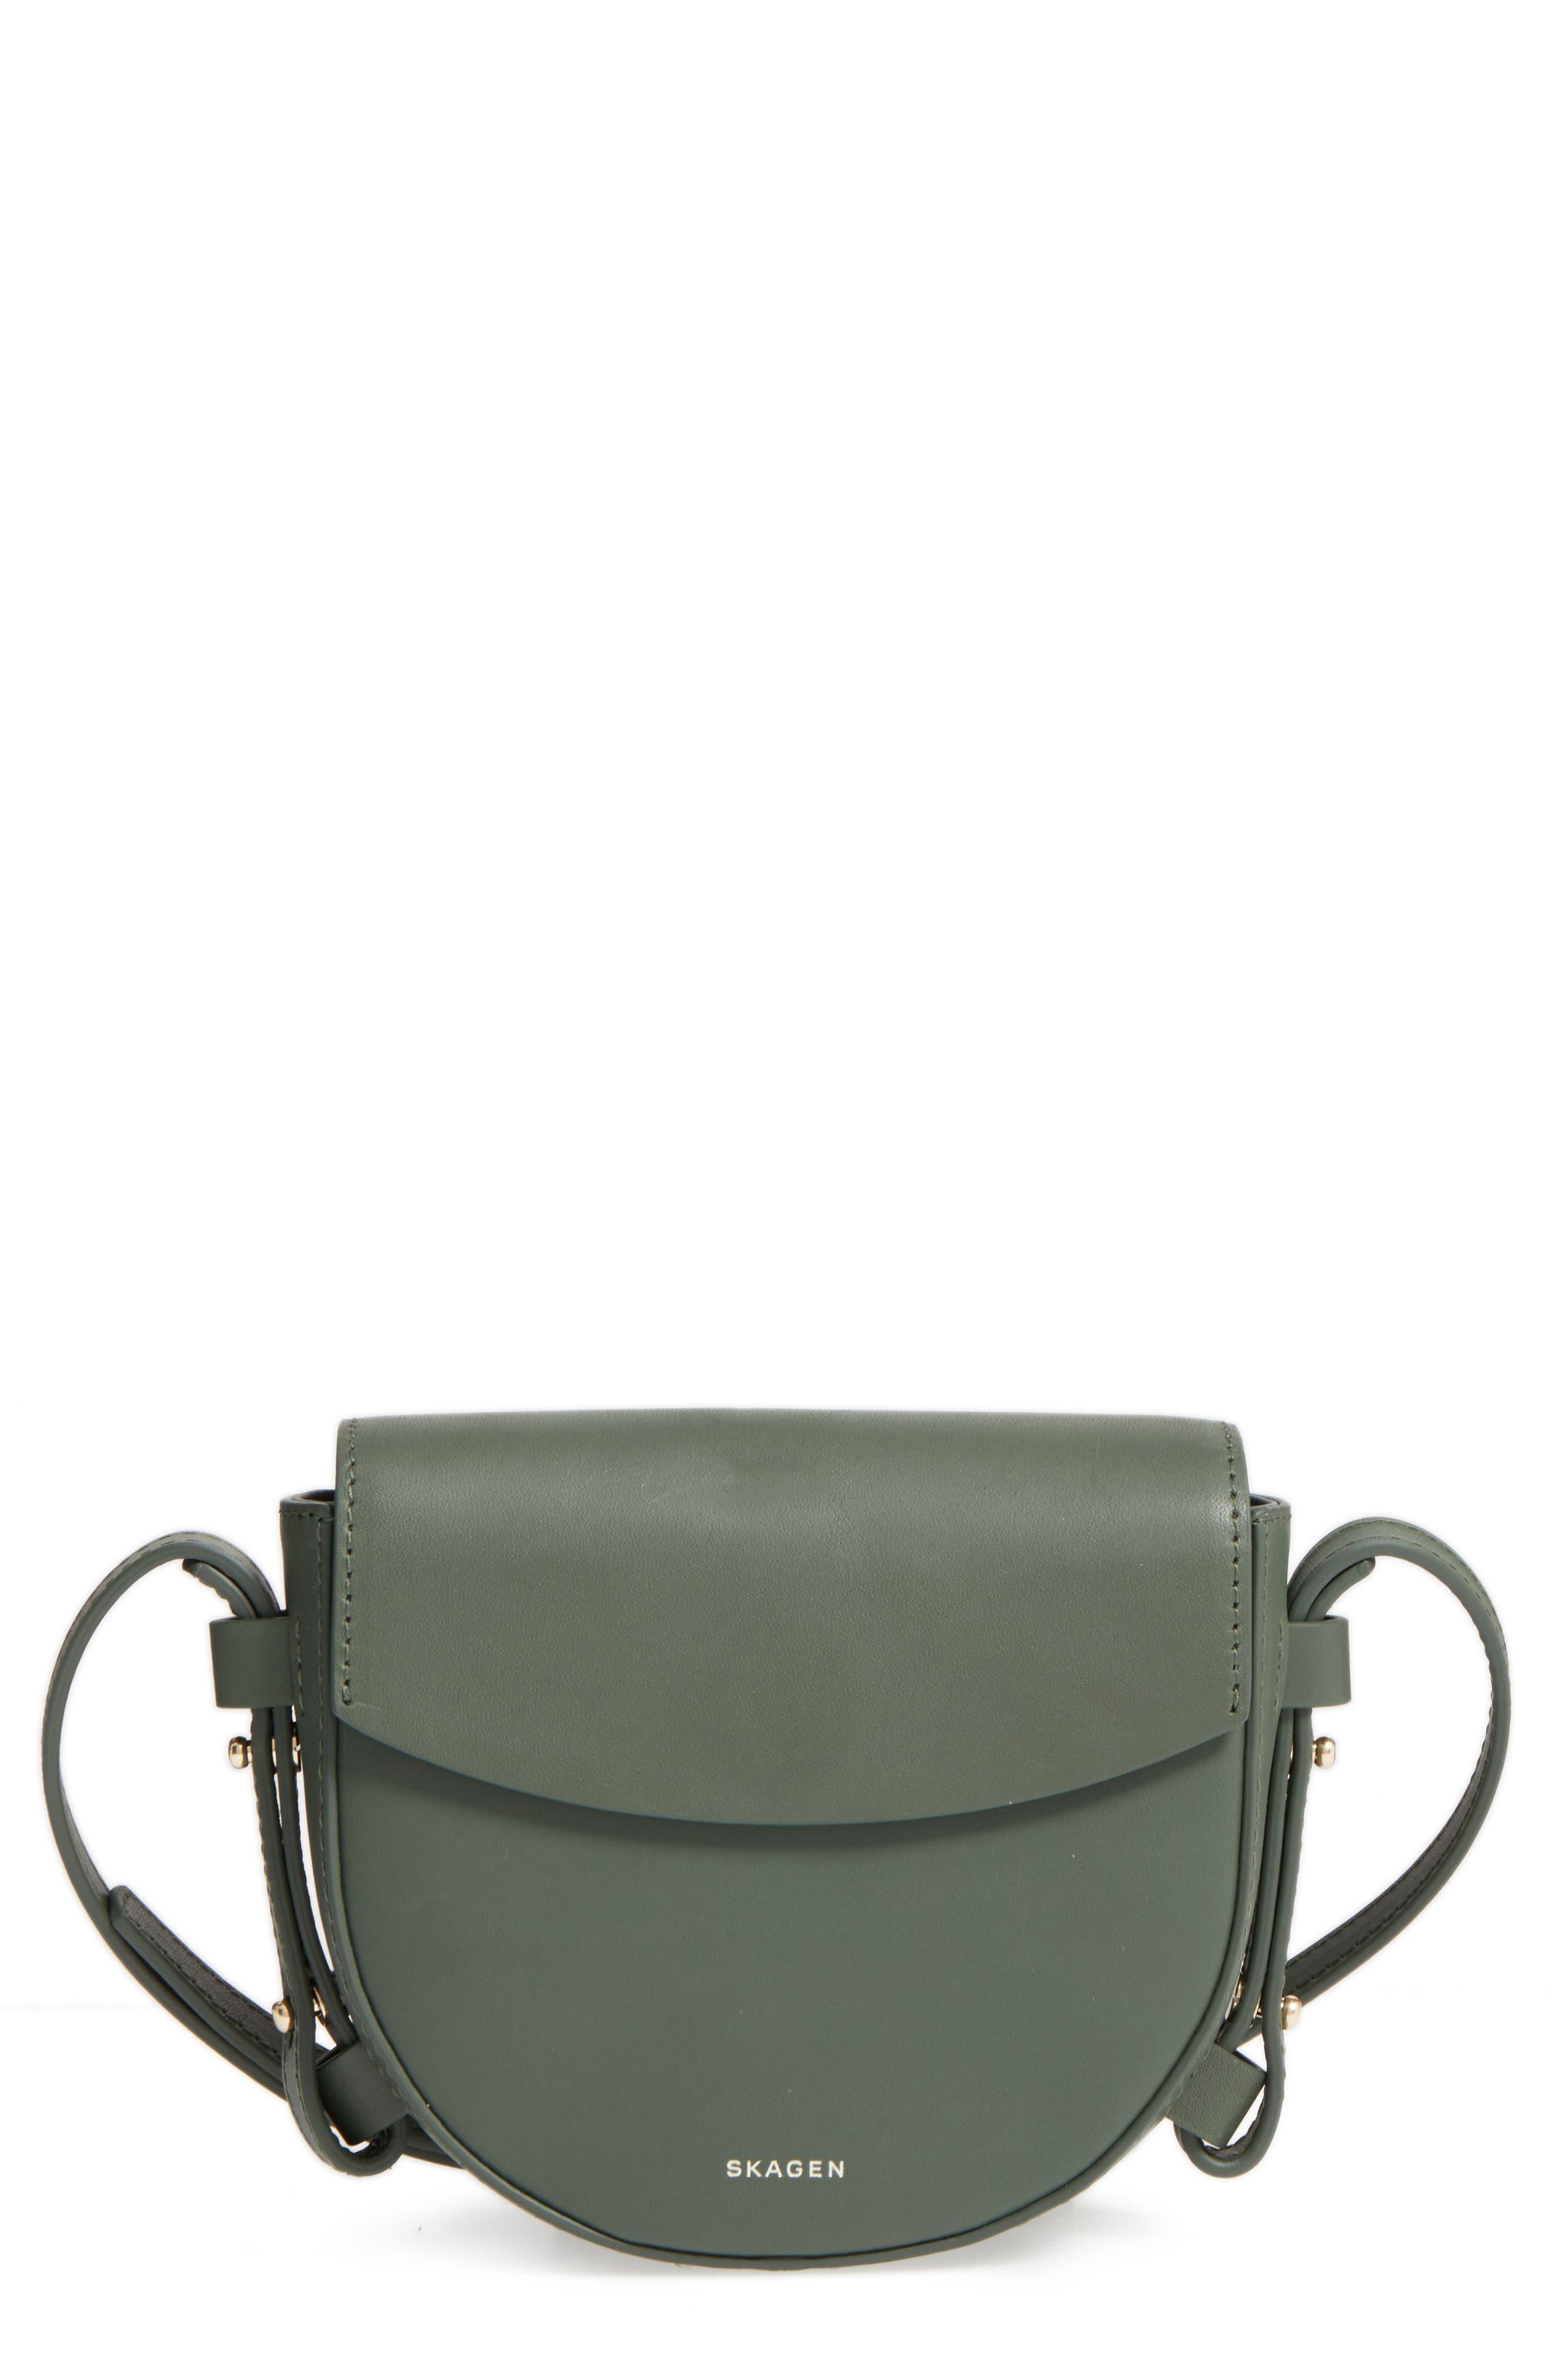 Skagen Mini Lobelle Leather Saddle Bag